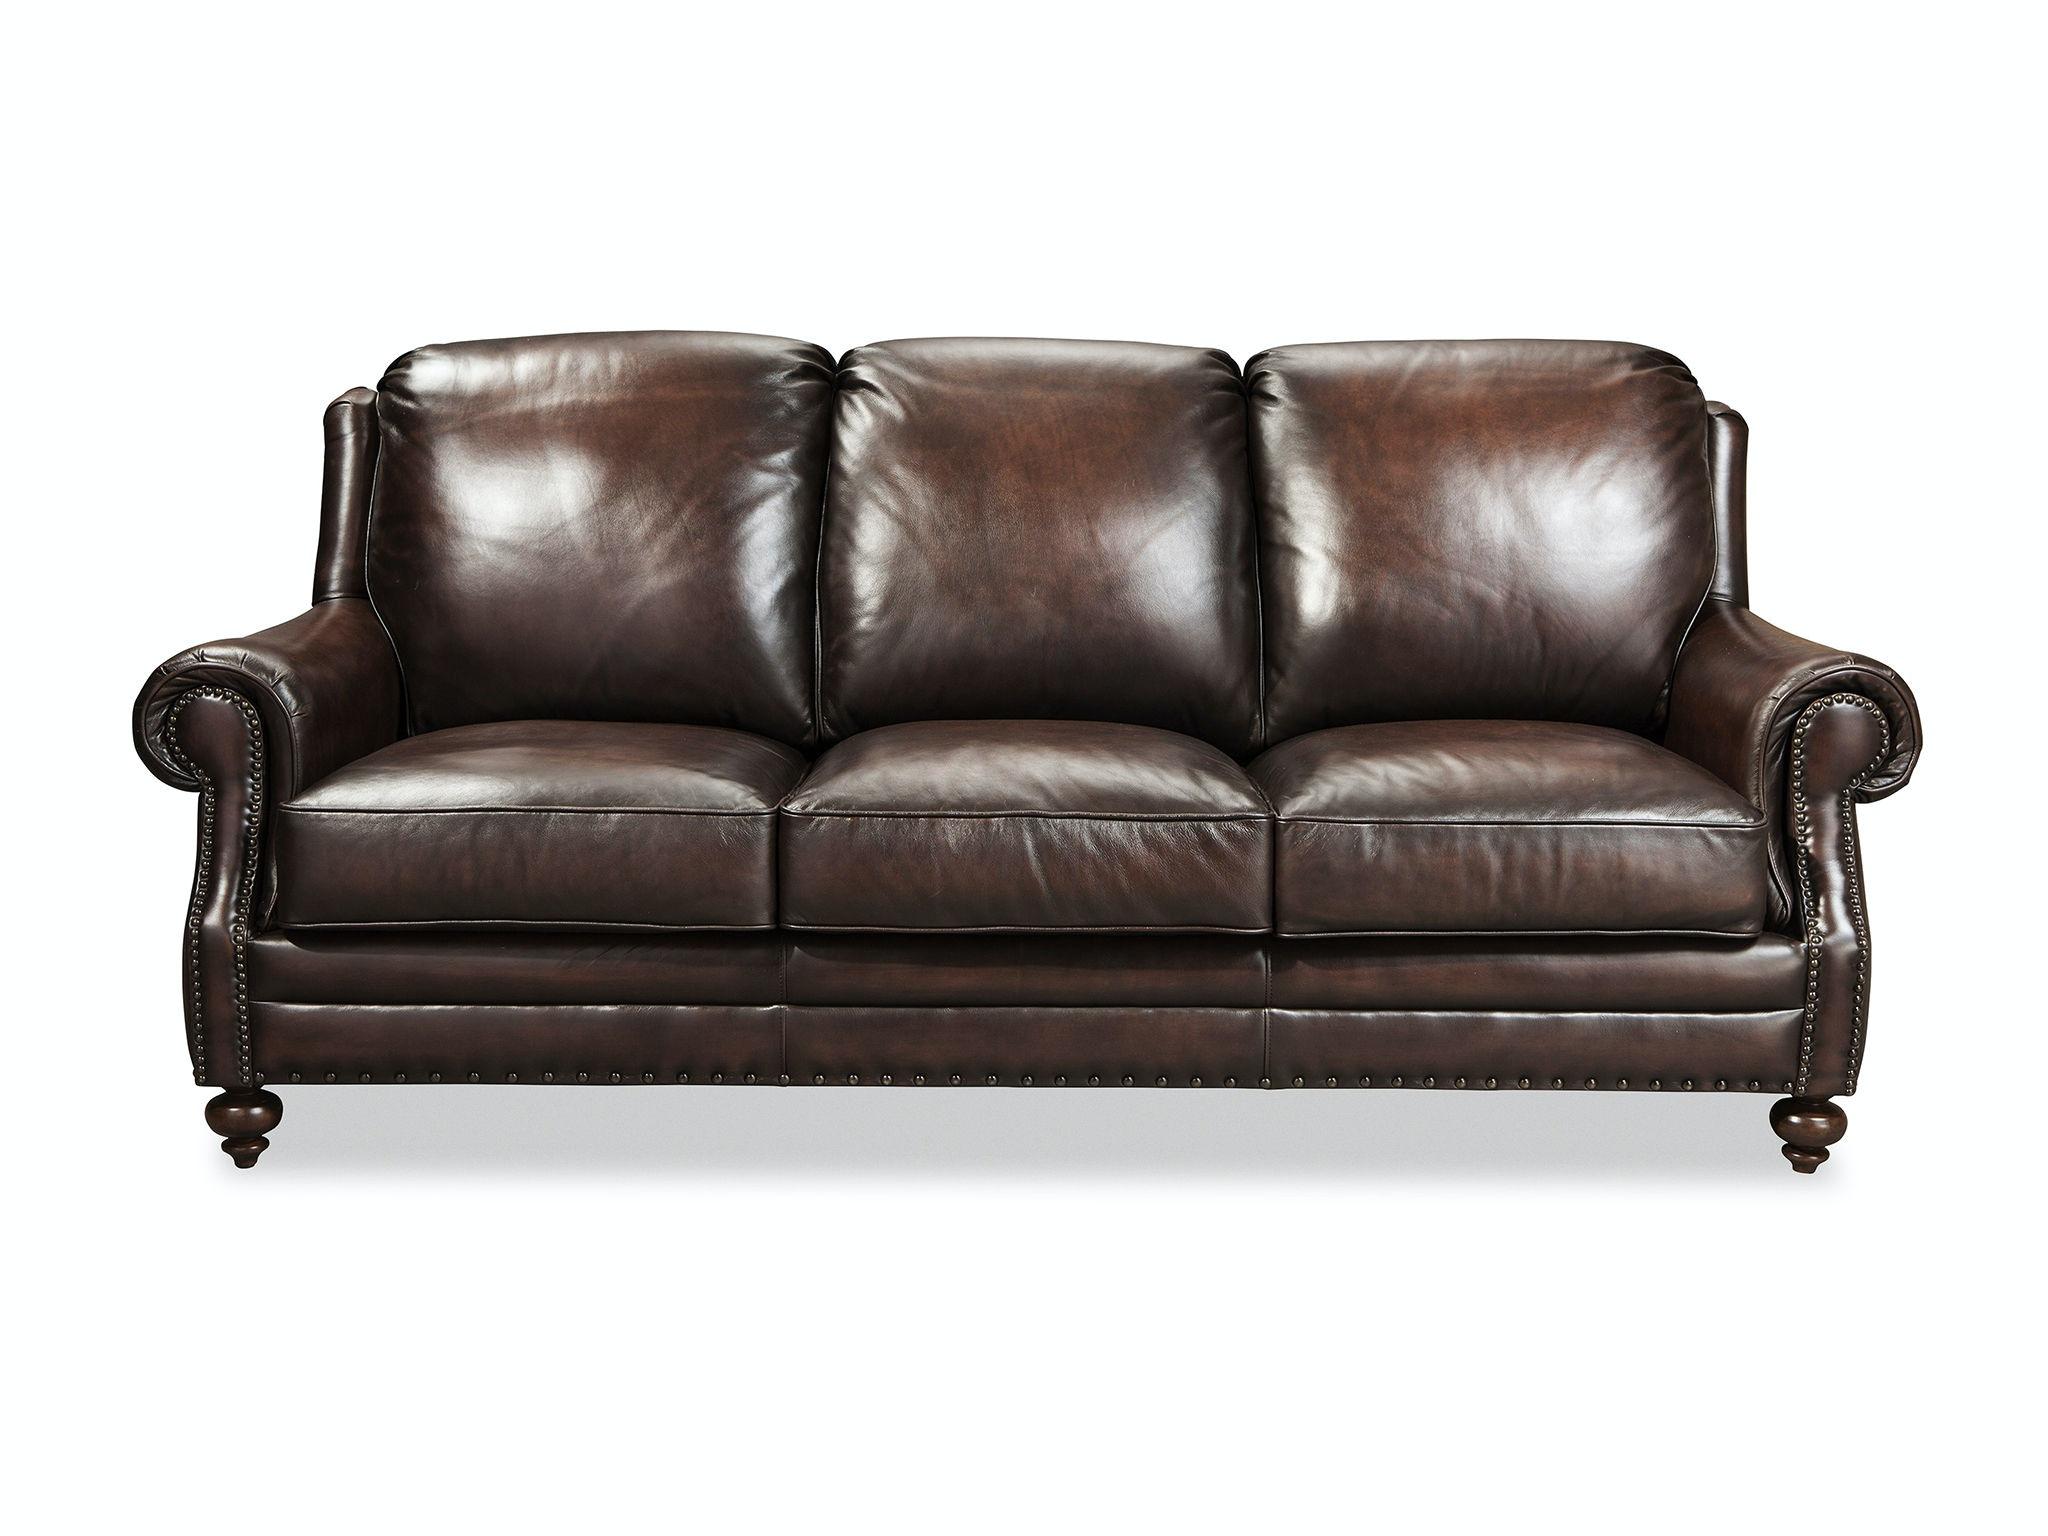 Craftmaster Living Room Sofa L171250 Craftmaster Hiddenite Nc